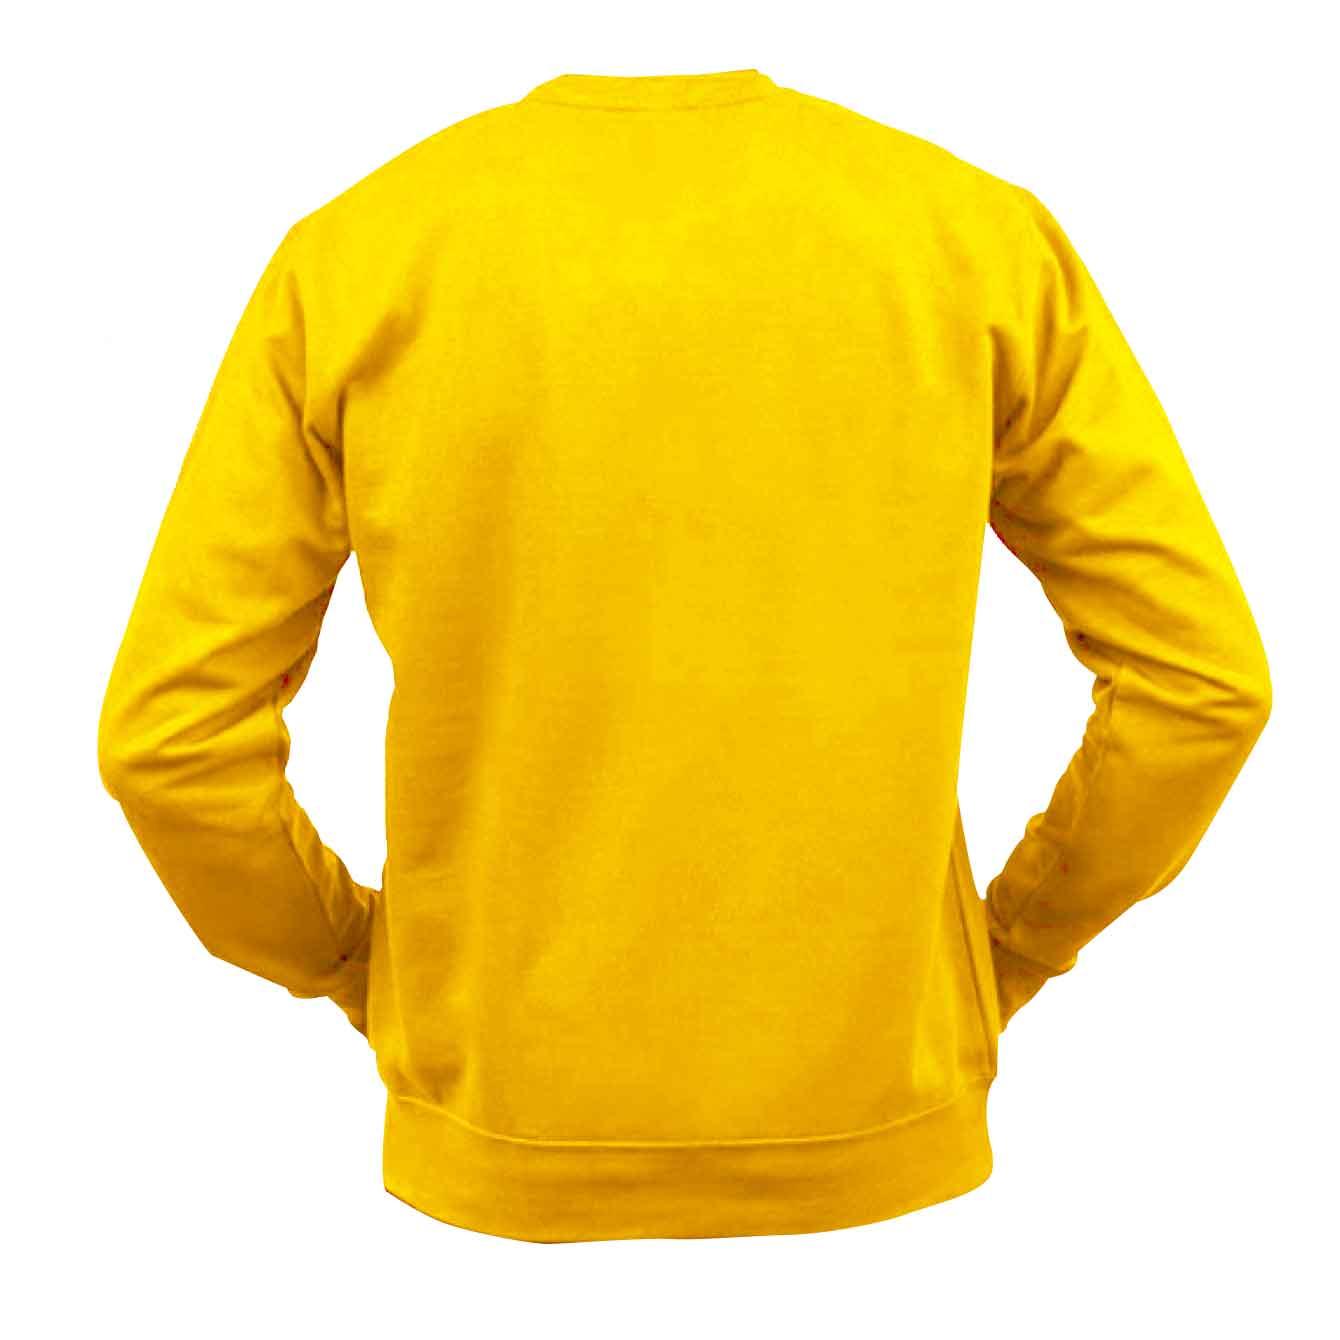 05_jh030_jaune_fonce--0-0--cf8258ba-a810-4775-b302-3655cf9ccf54